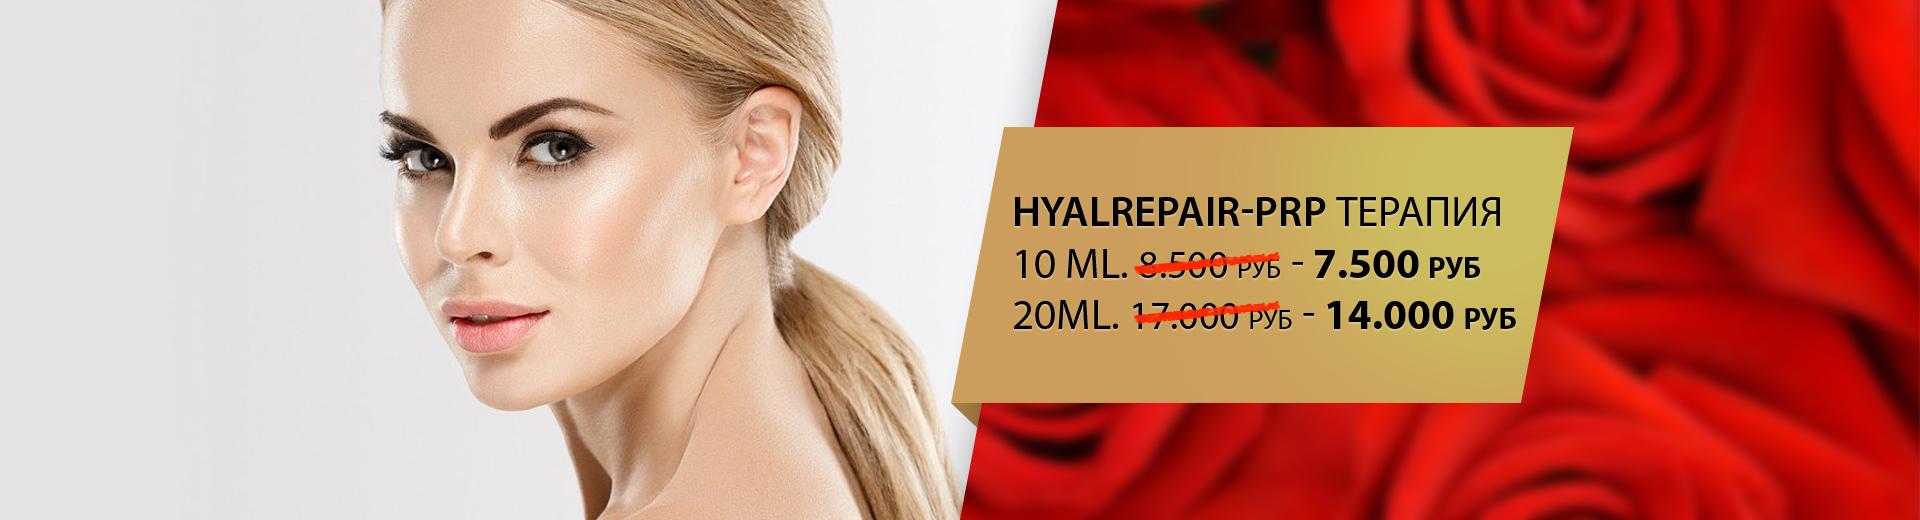 HYALREPAIR-PRP терапия со скидкой